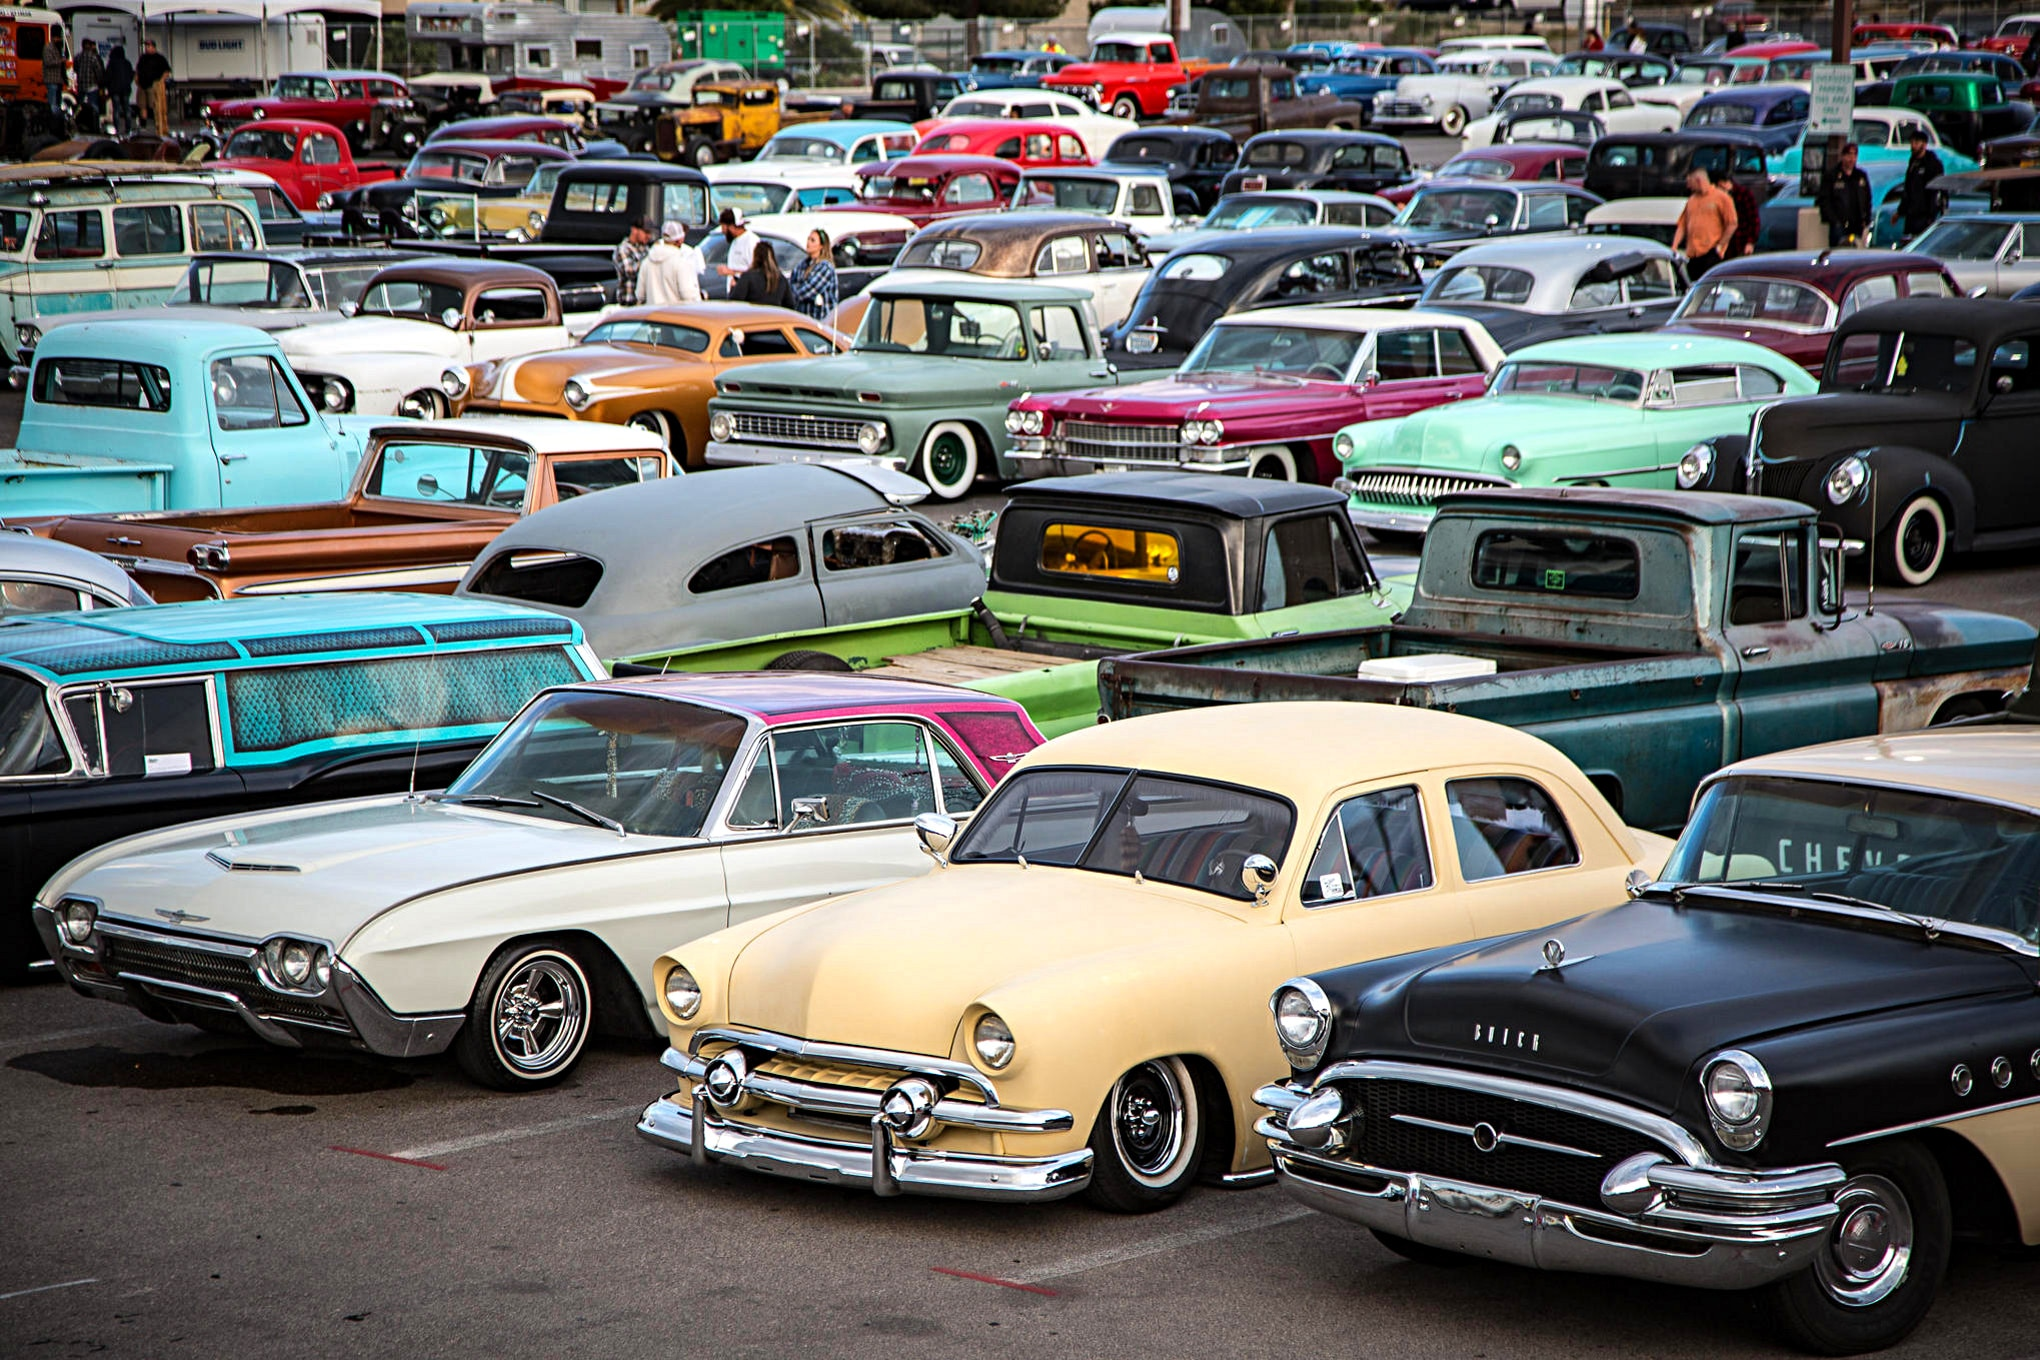 The Best Photos from Viva Las Vegas 2018! | Automobile Magazine